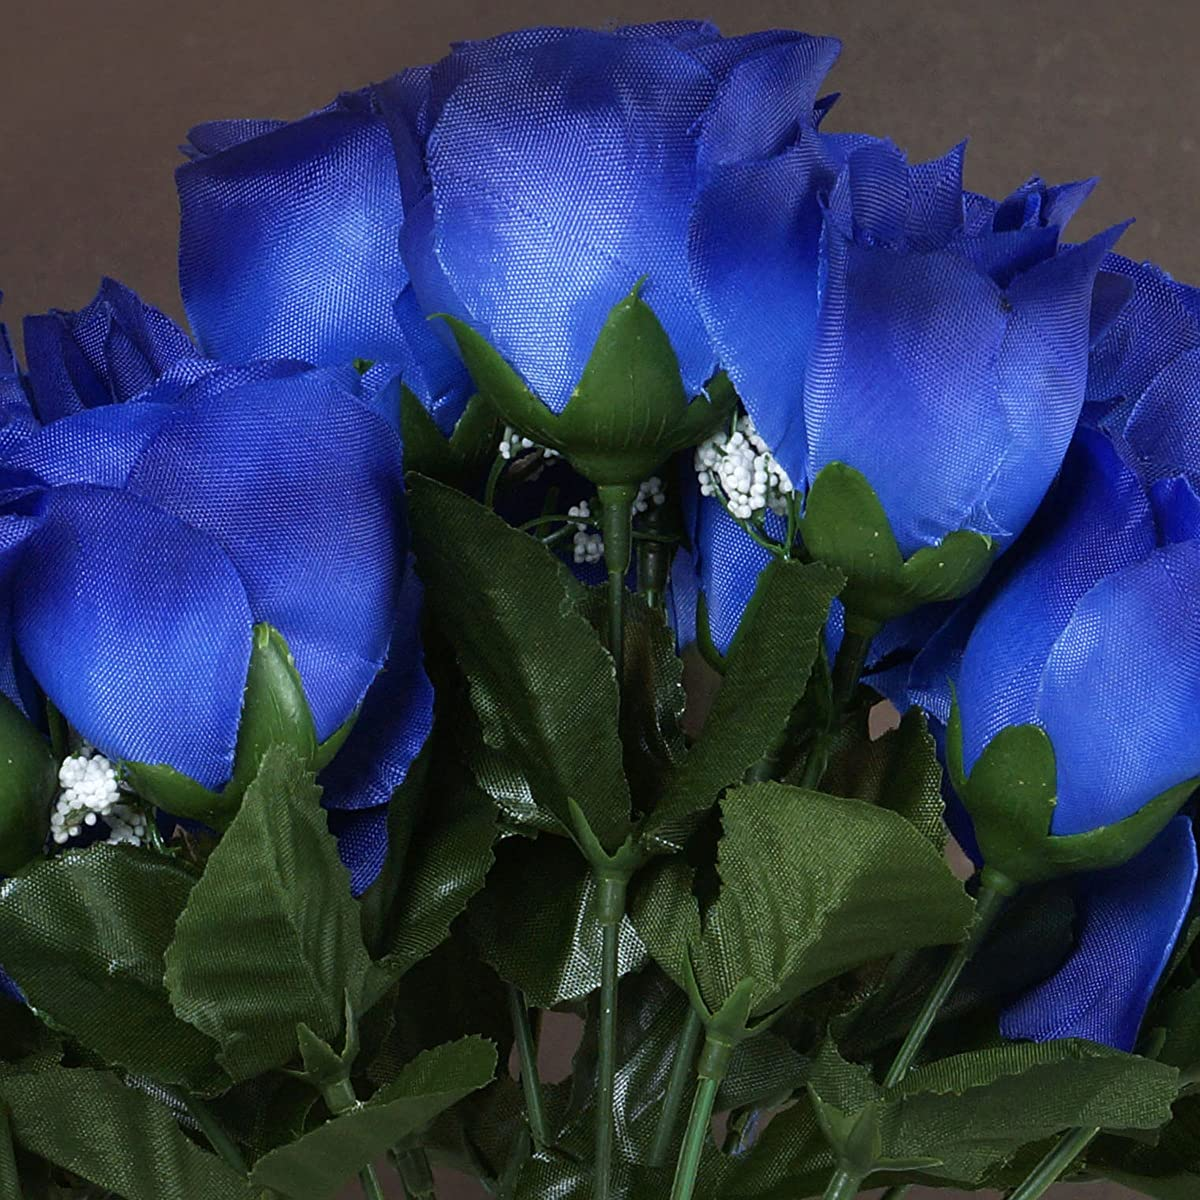 Efavormart 84 artificial buds roses wedding flowers bouquets sale efavormart 84 artificial buds roses wedding flowers bouquets sale royal blue izmirmasajfo